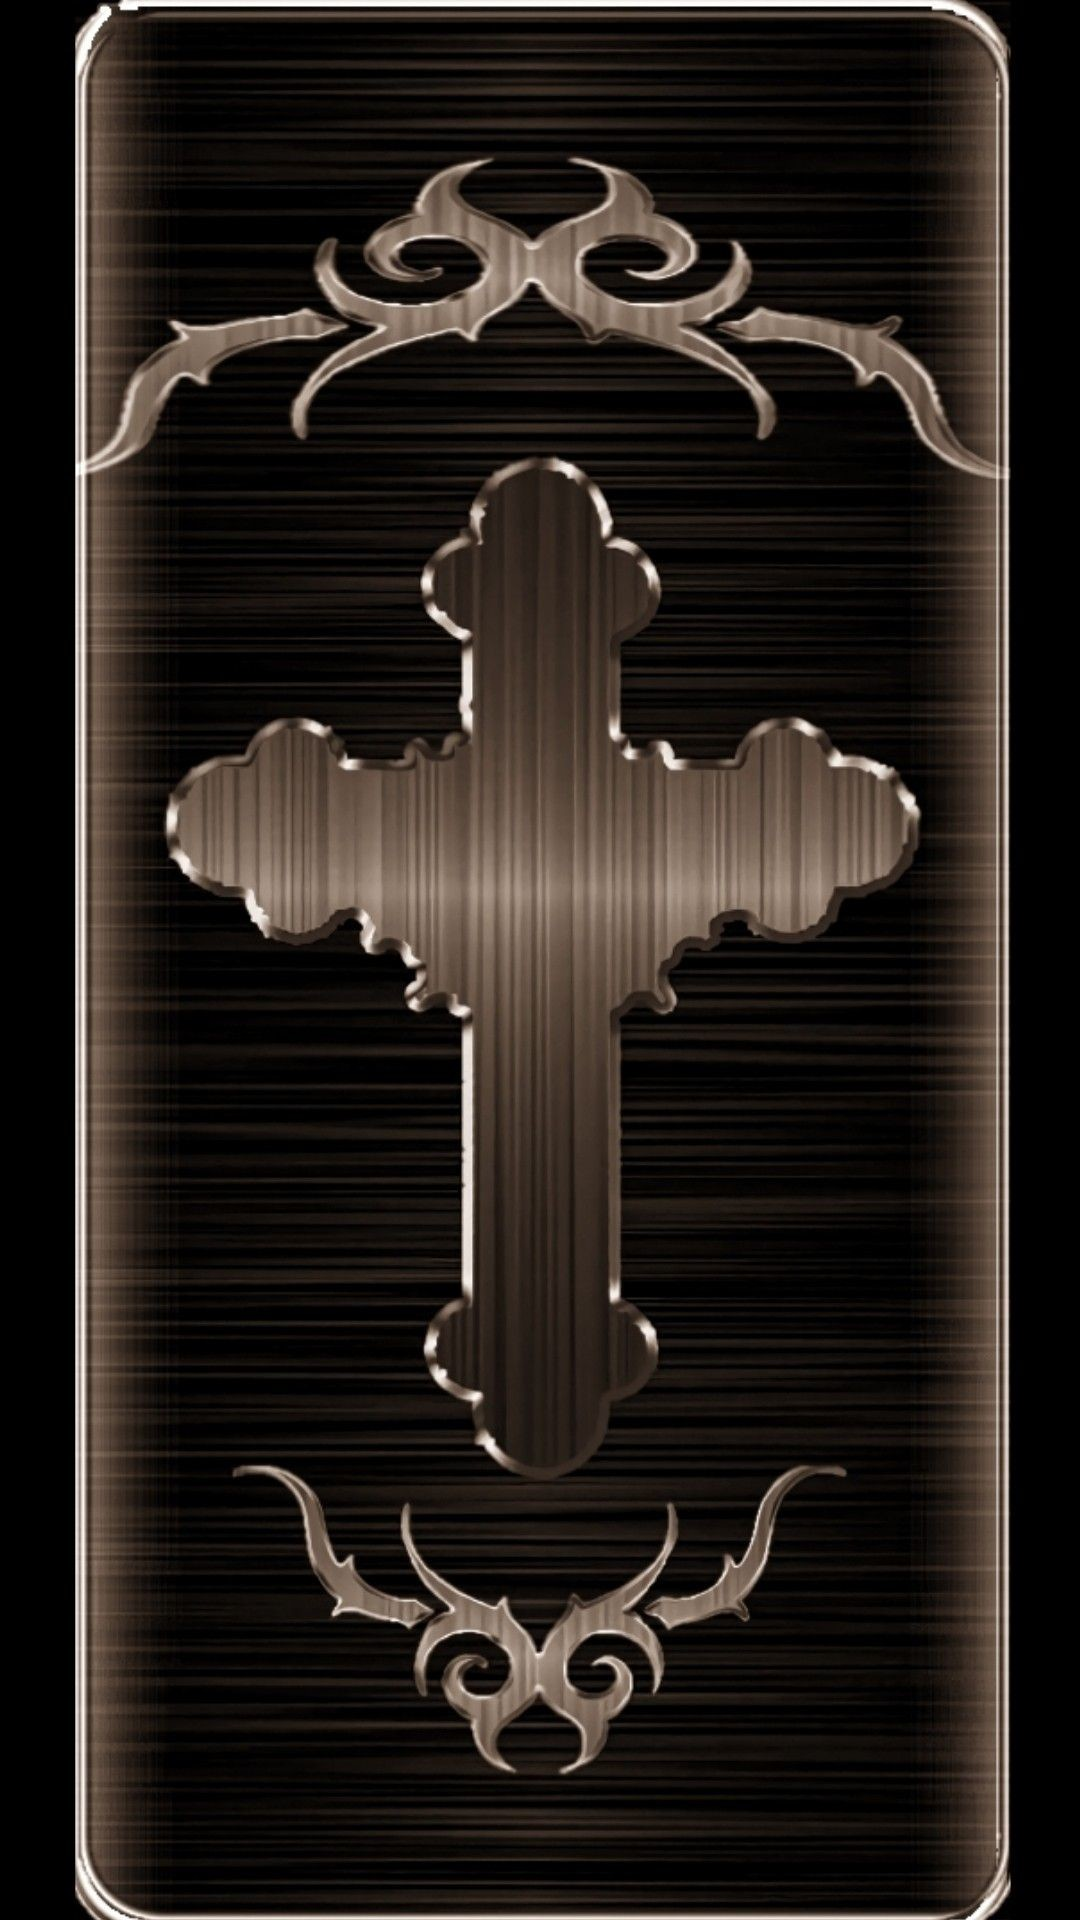 Res: 1080x1920, Pin by Татьяна Семёнова on Сотовый телефон обои | Pinterest | Cross  wallpaper and Wallpaper